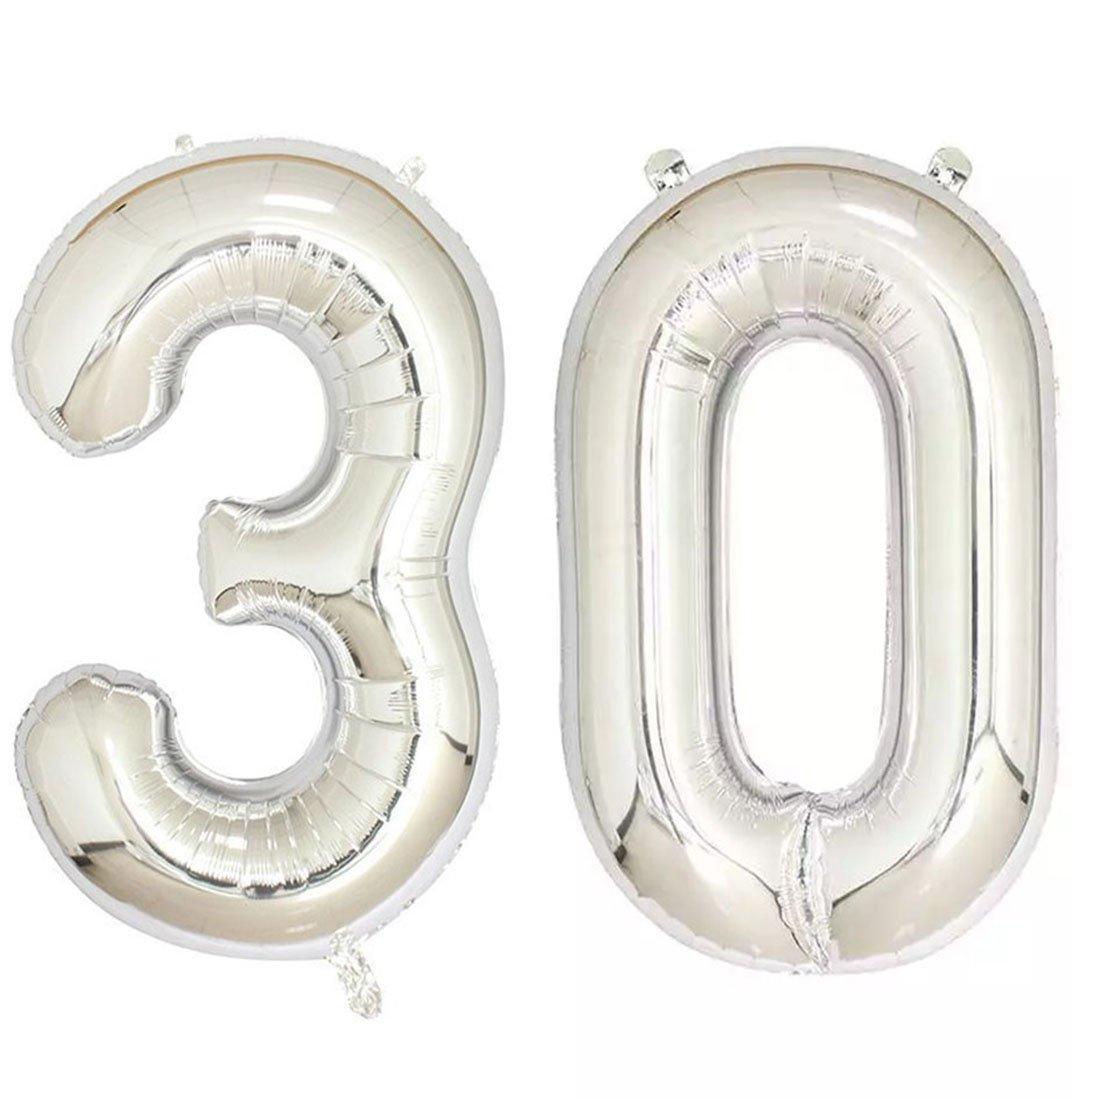 Amazon.com: 40 inch 21 Helio Jumbo Digital Número de globos ...